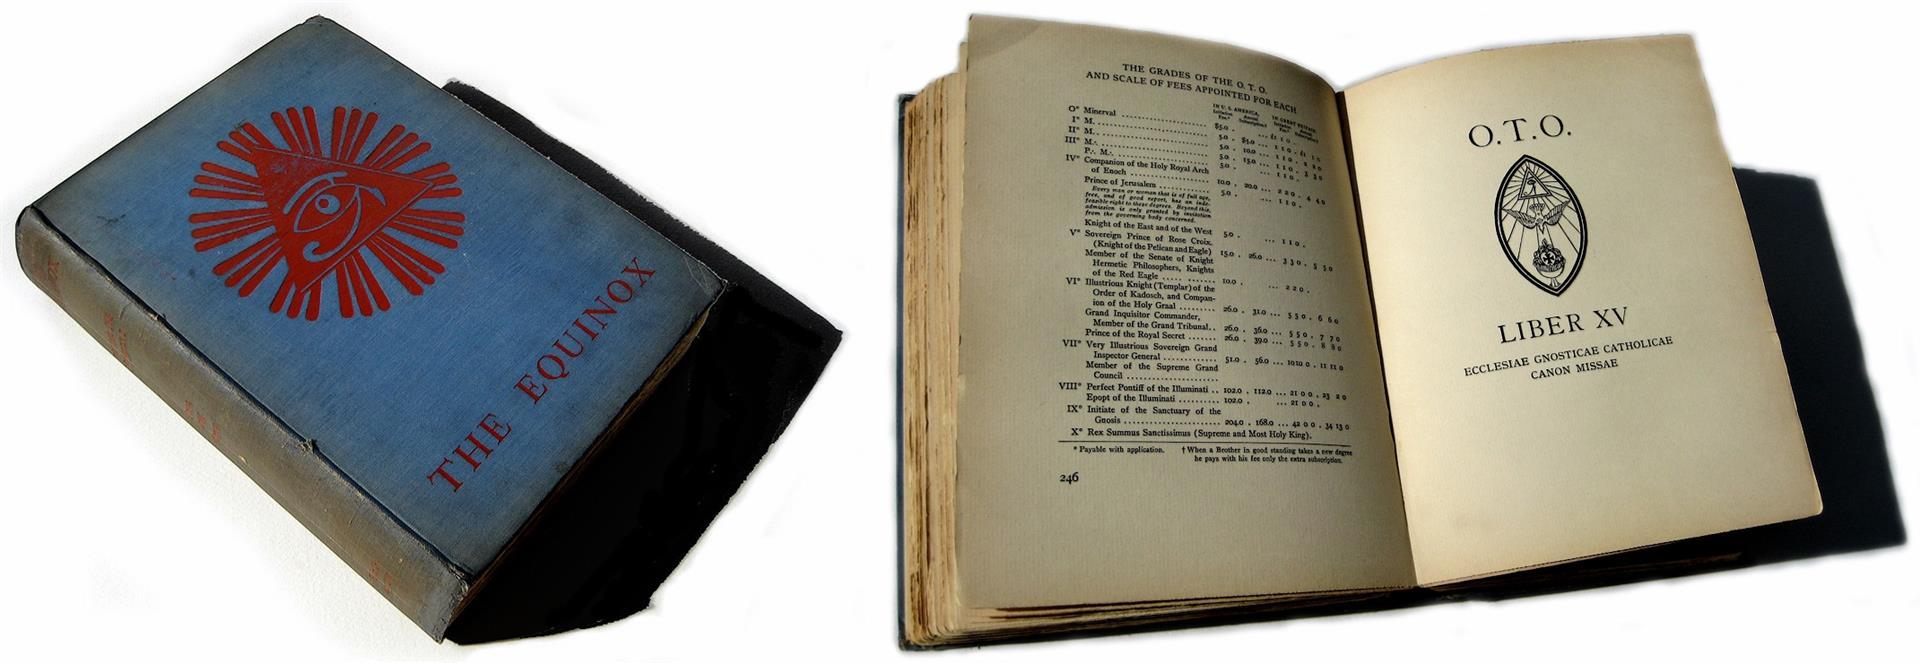 Aleister Crowley Blue Equinox Volume III, Number I Ordo Templi Orientis